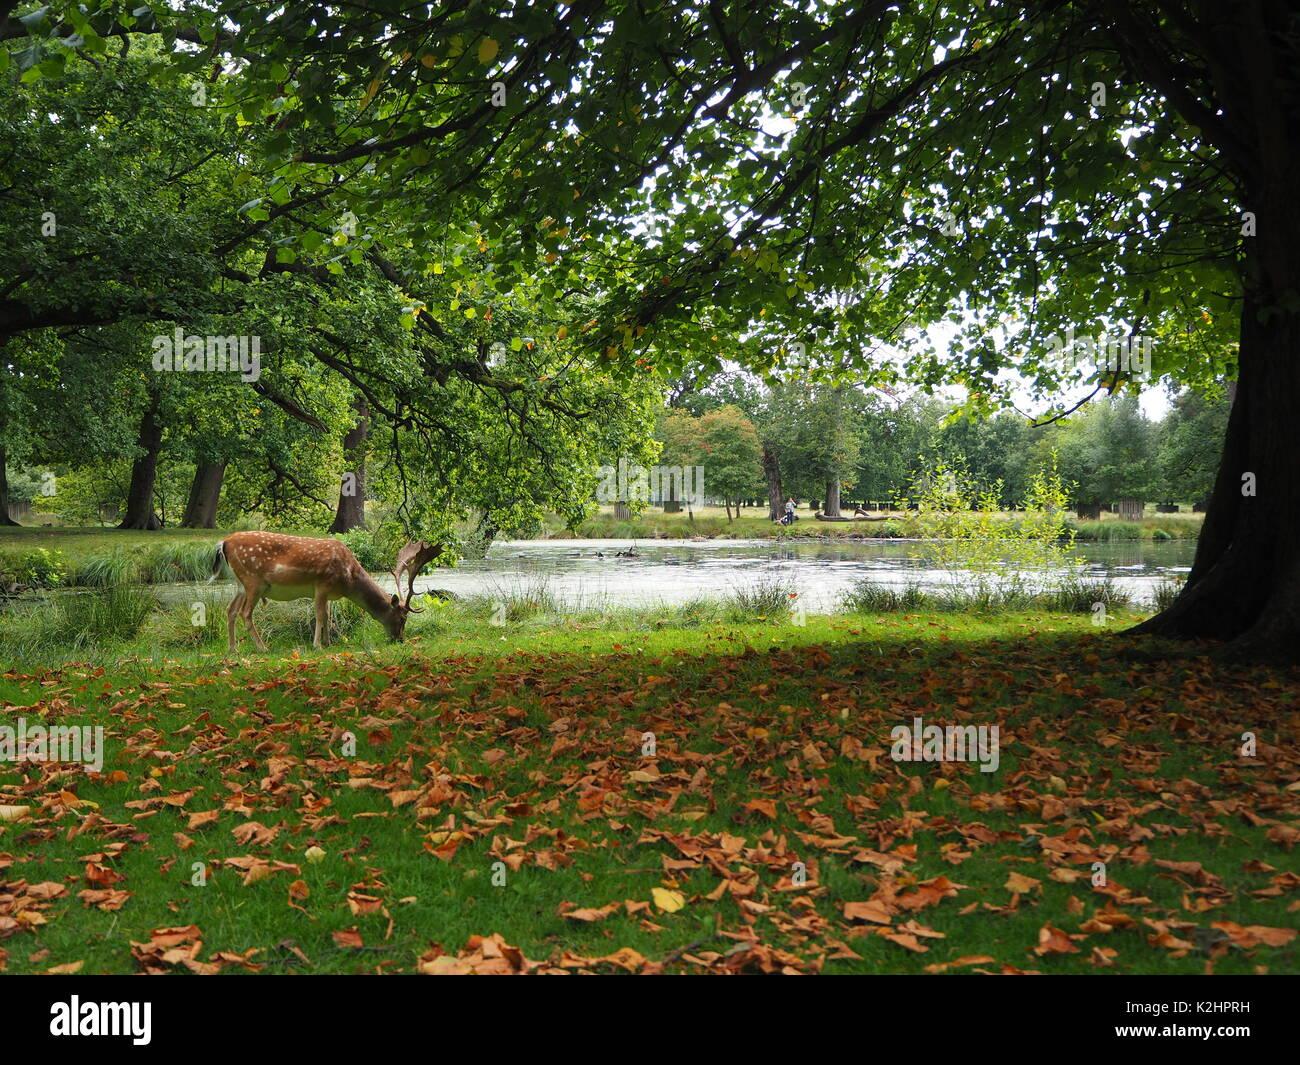 Grazing deer by a lake at Dunham Massey deer park - Stock Image